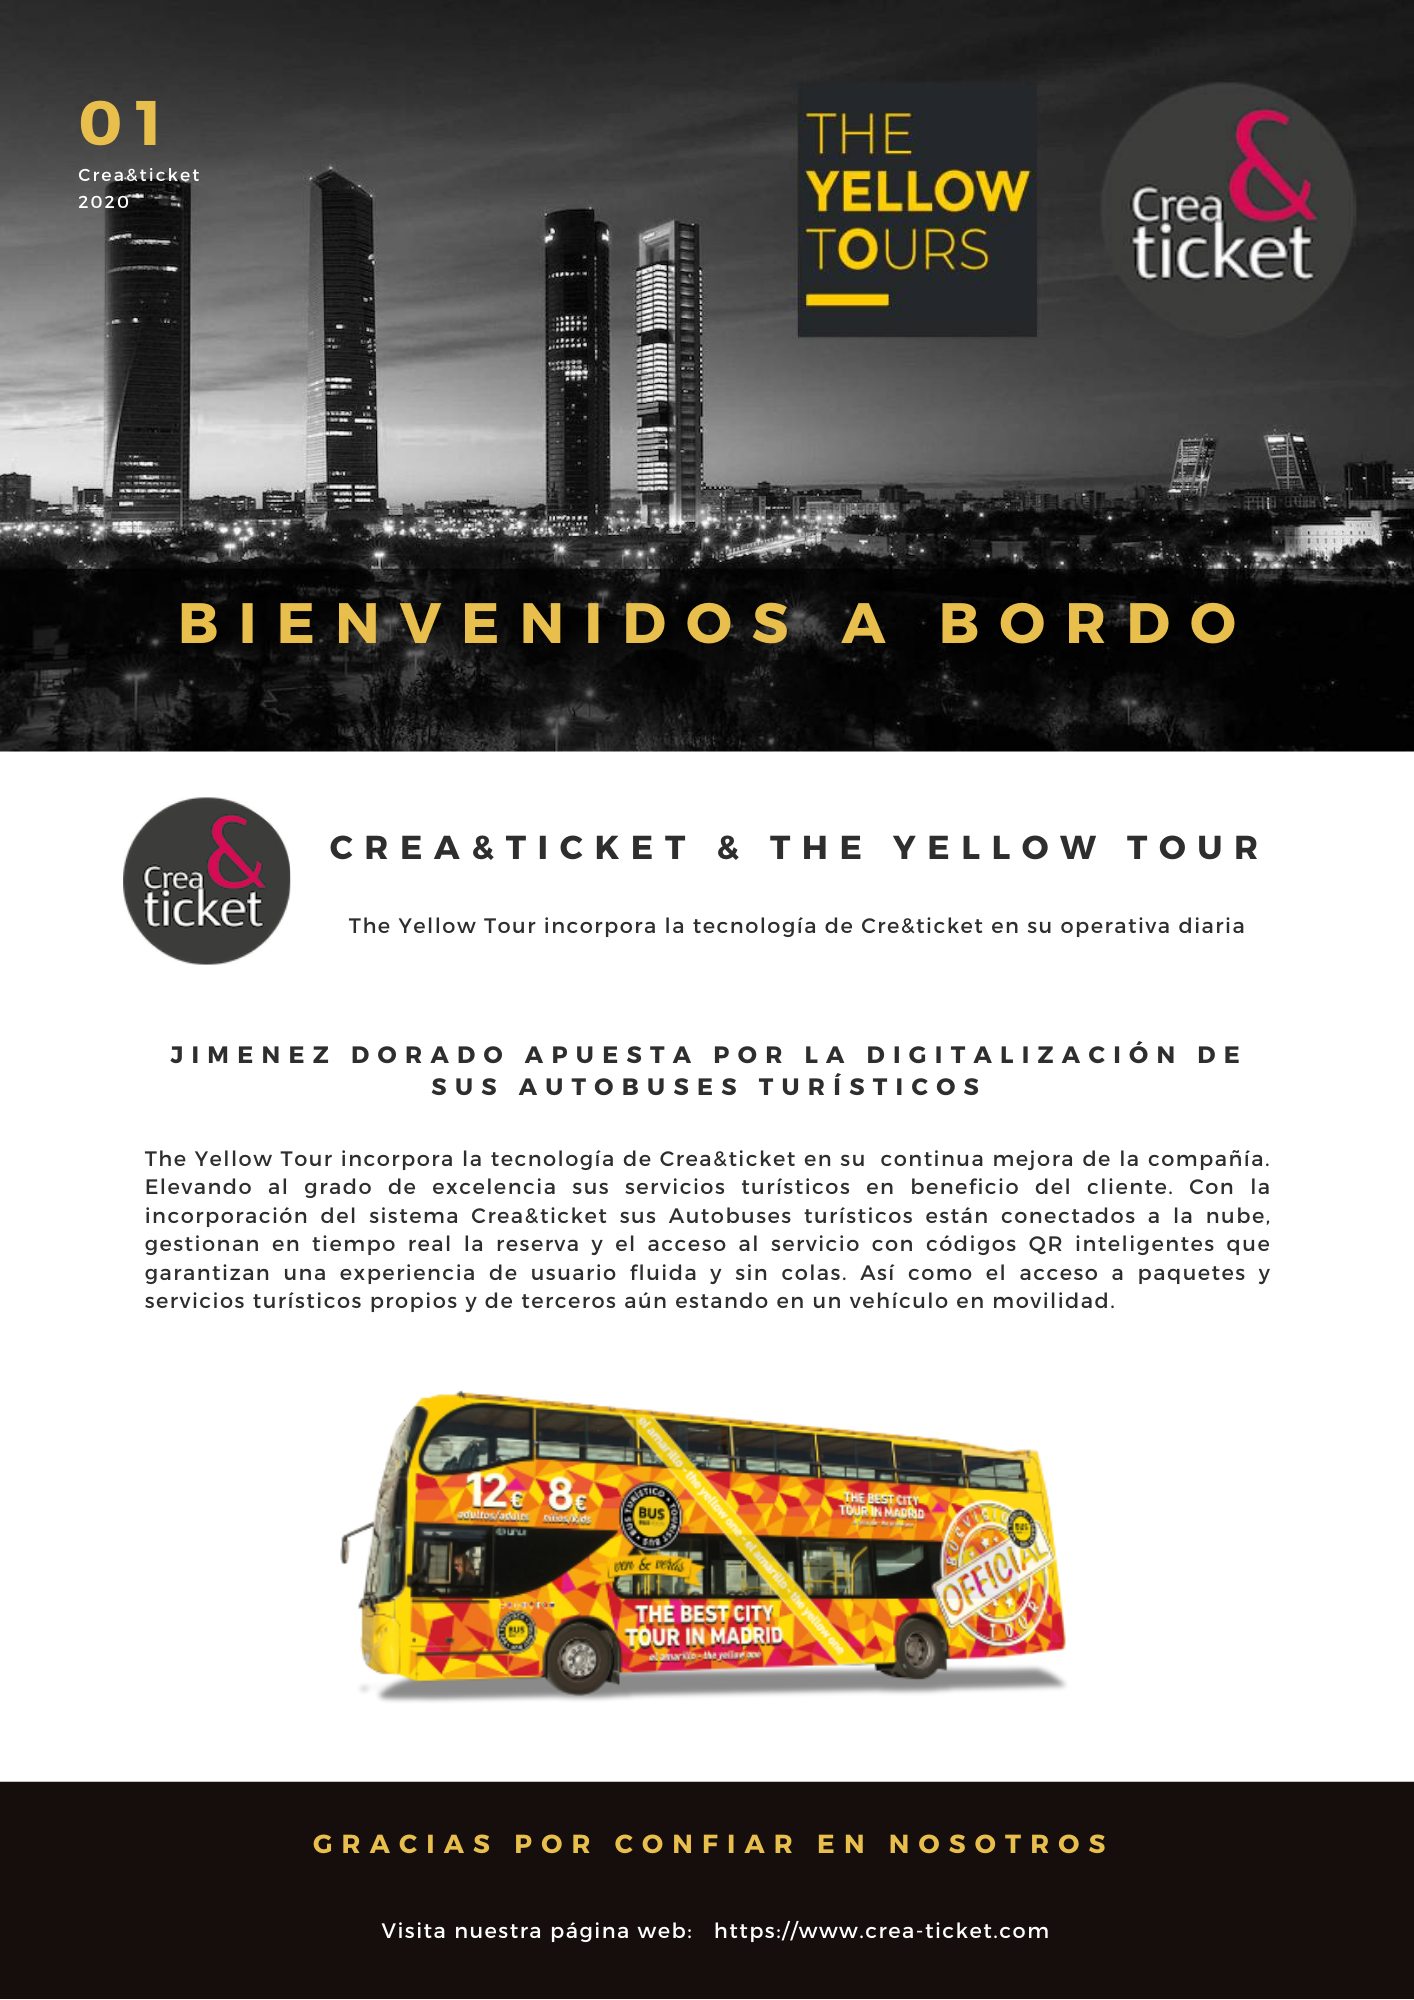 The Yellow Tours digitaliza sus servicios turísticos